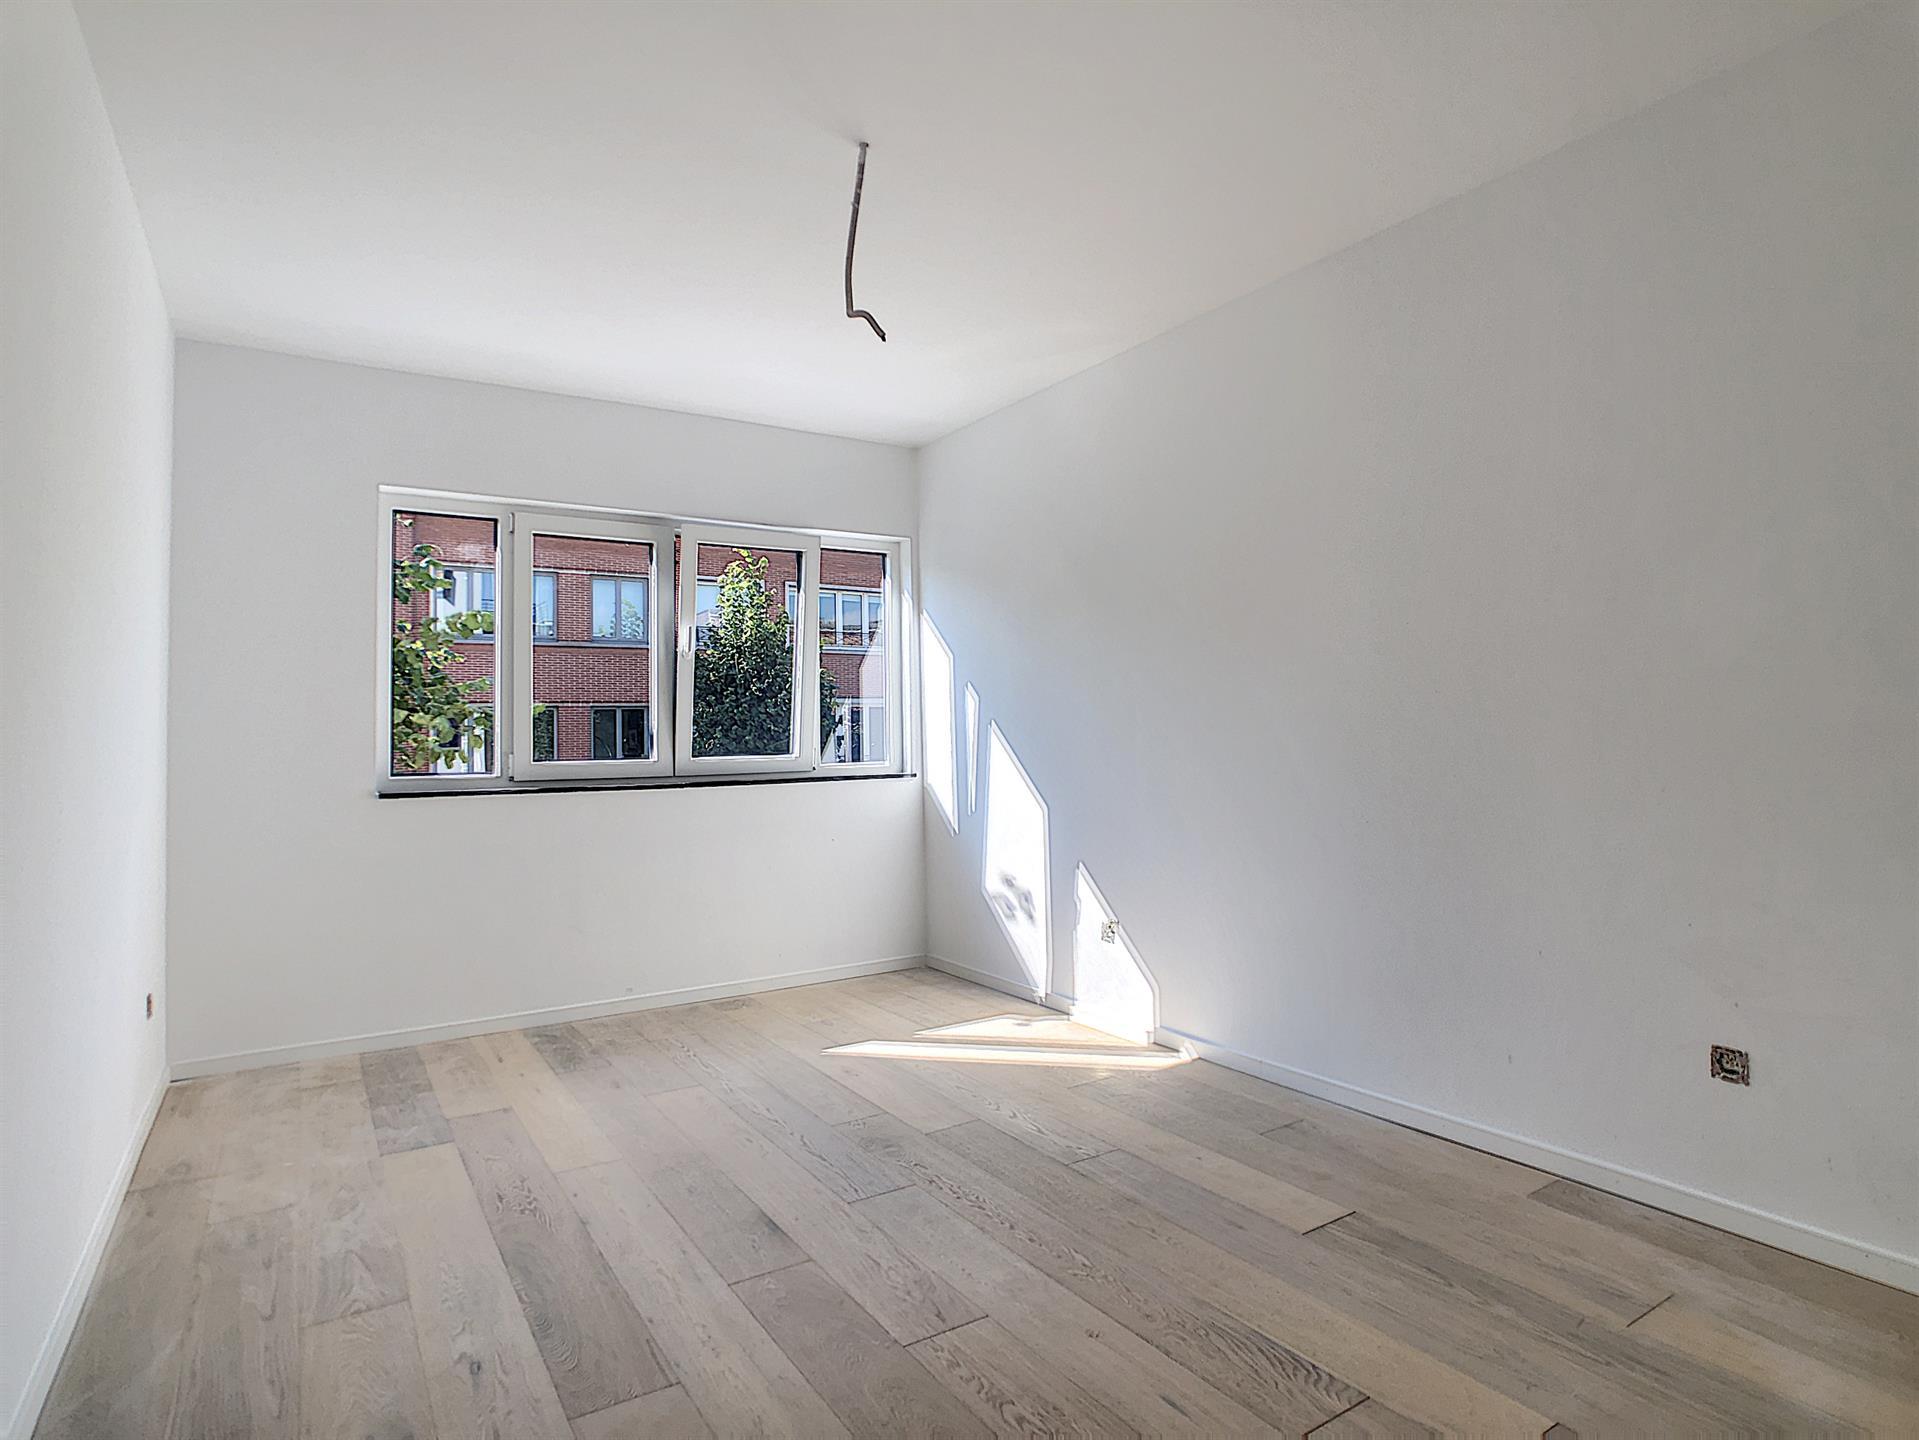 Appartement - Anderlecht - #4252375-34